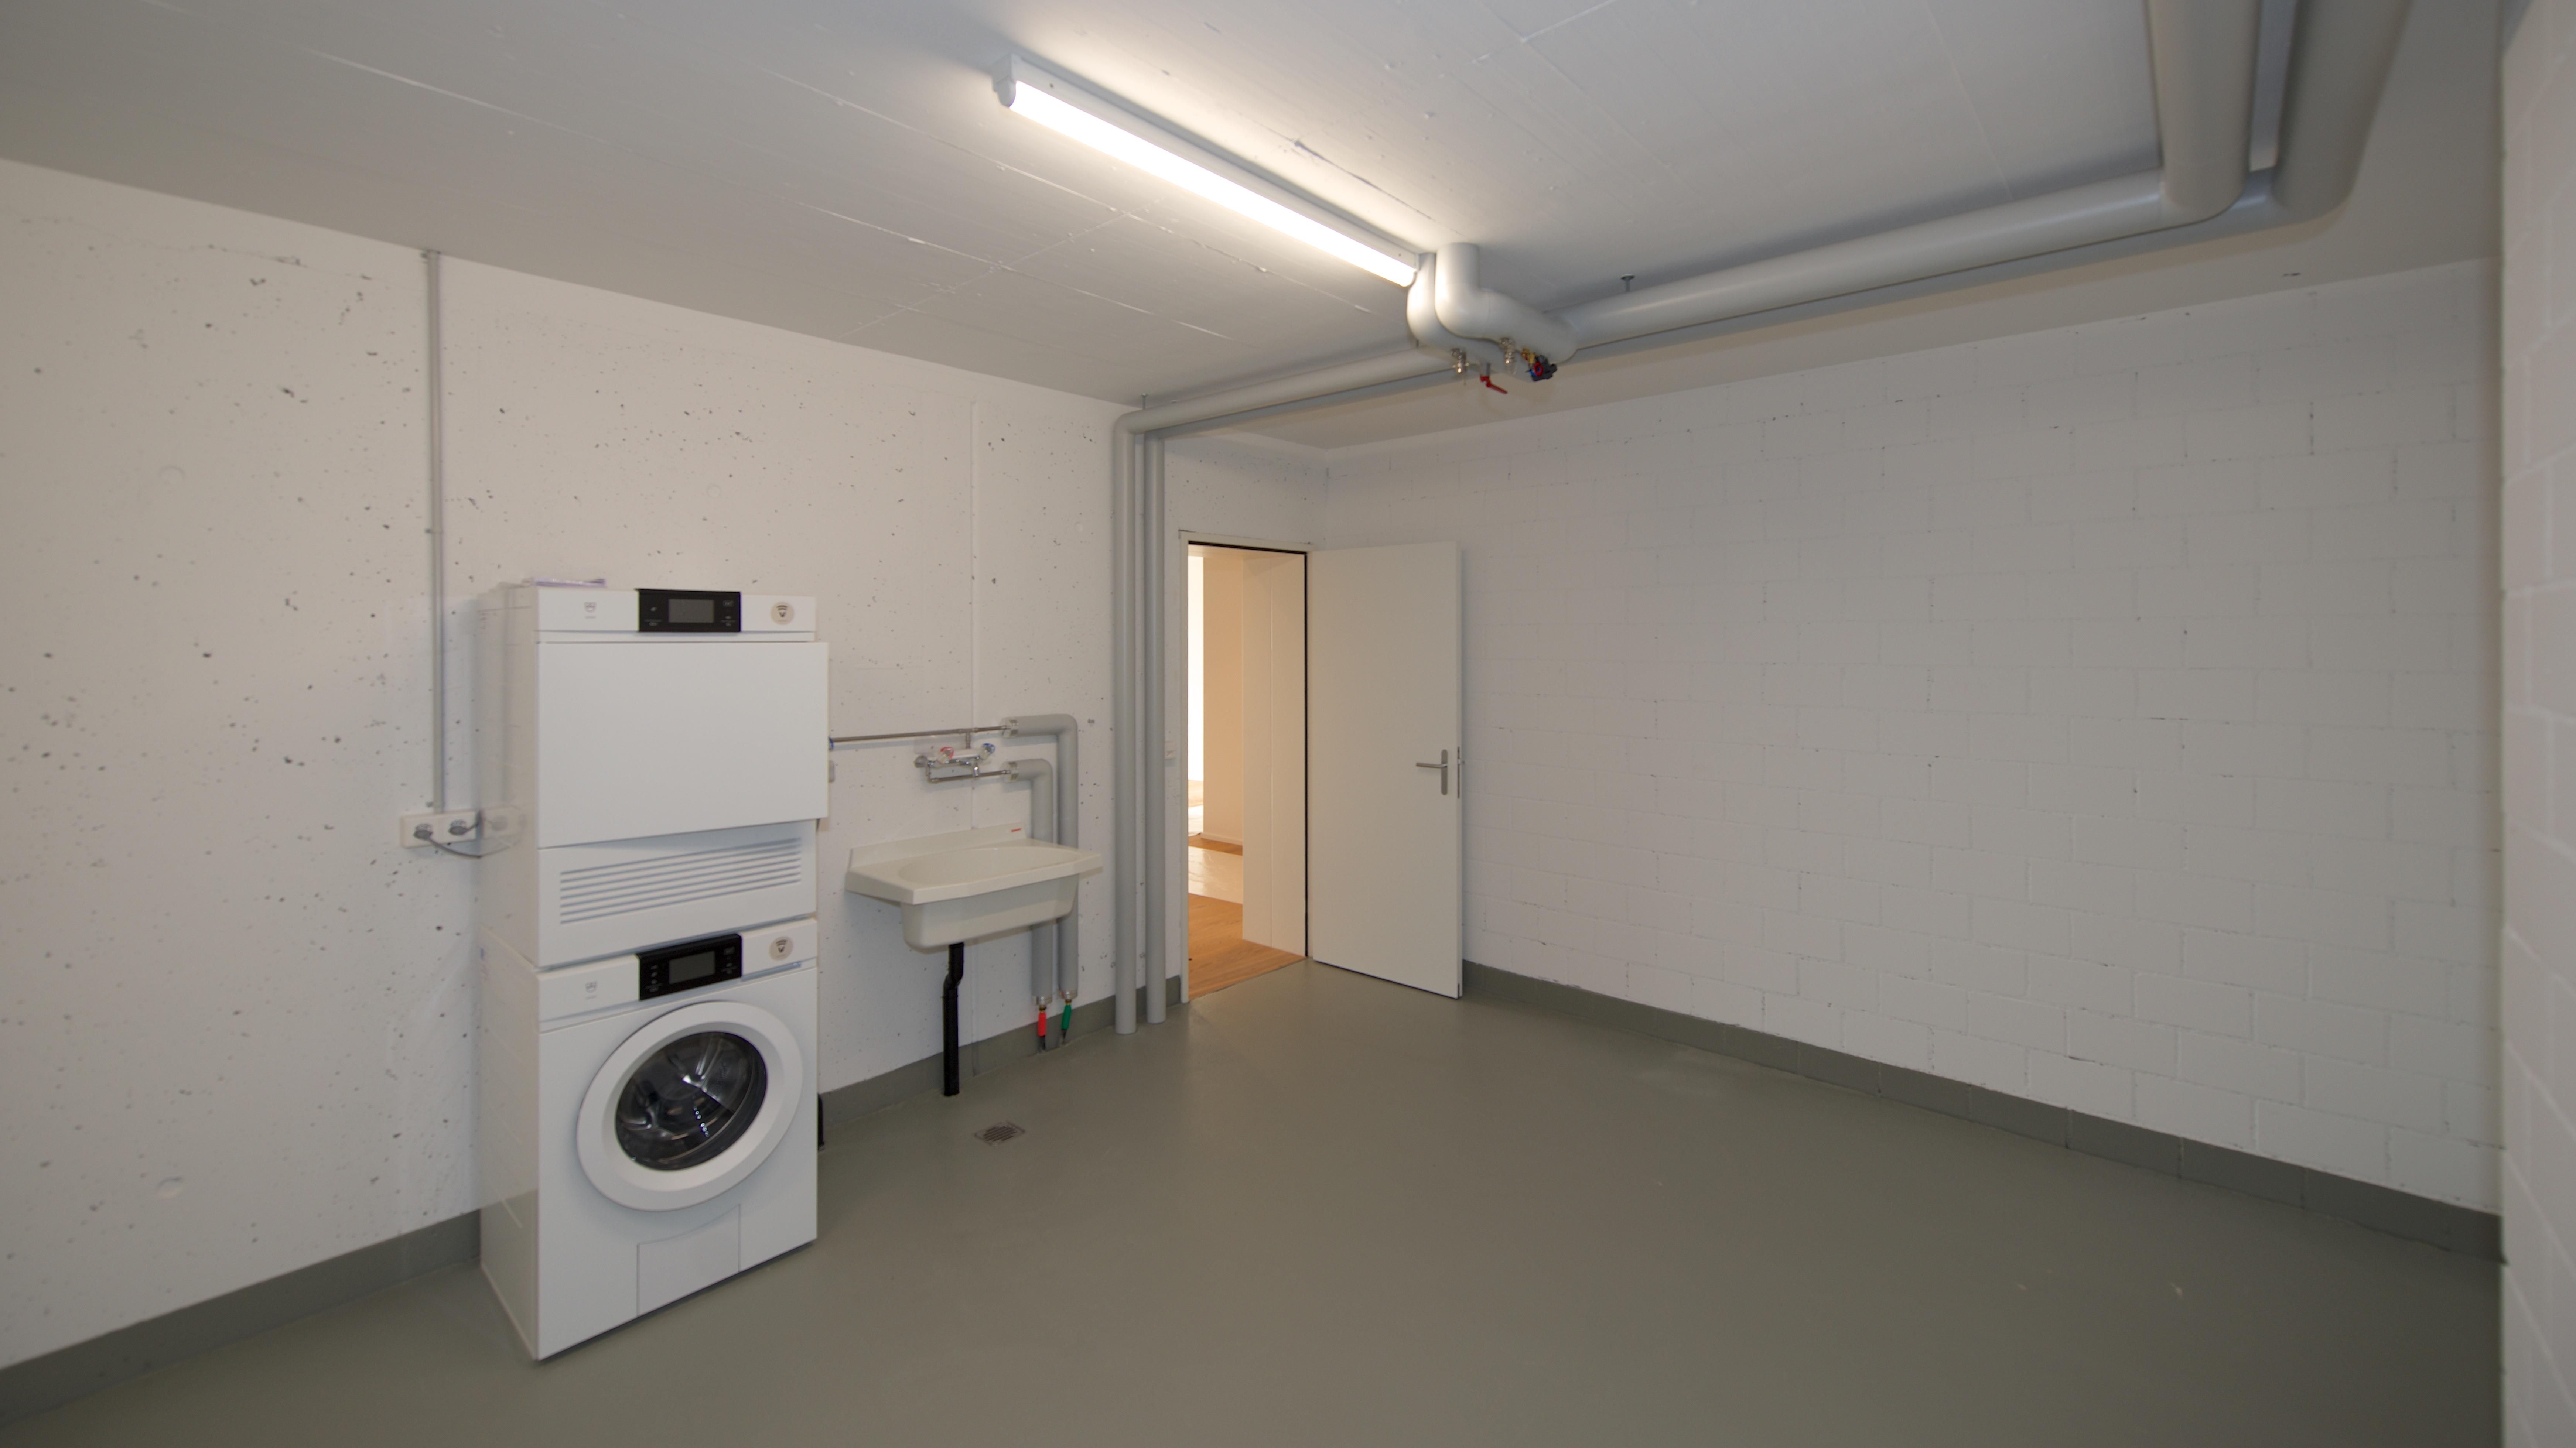 Keller mit dem Waschturm